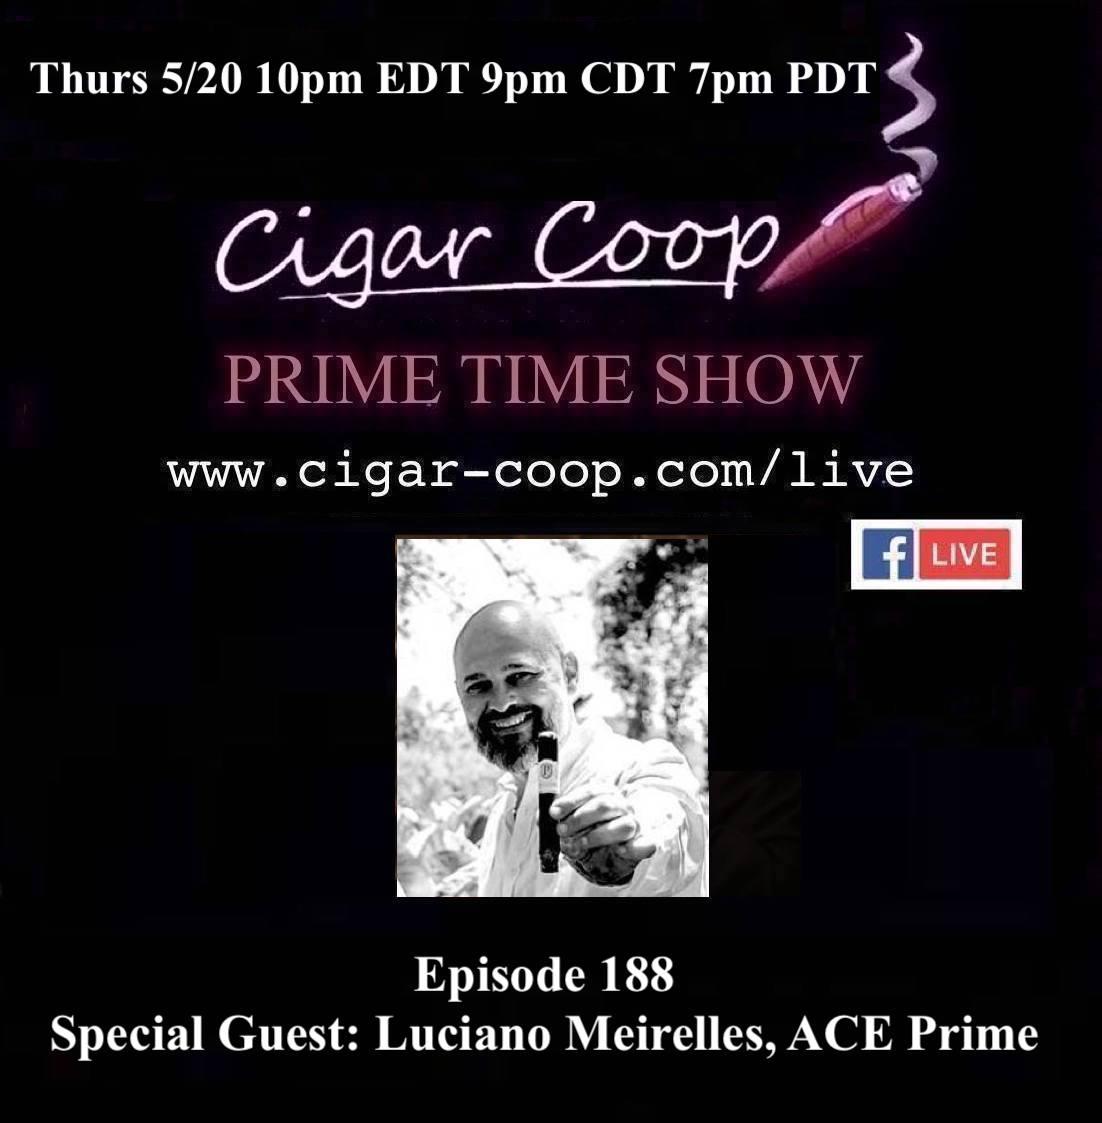 Announcement: Prime Time Episode 188 – Luciano Meirelles, ACE Prime